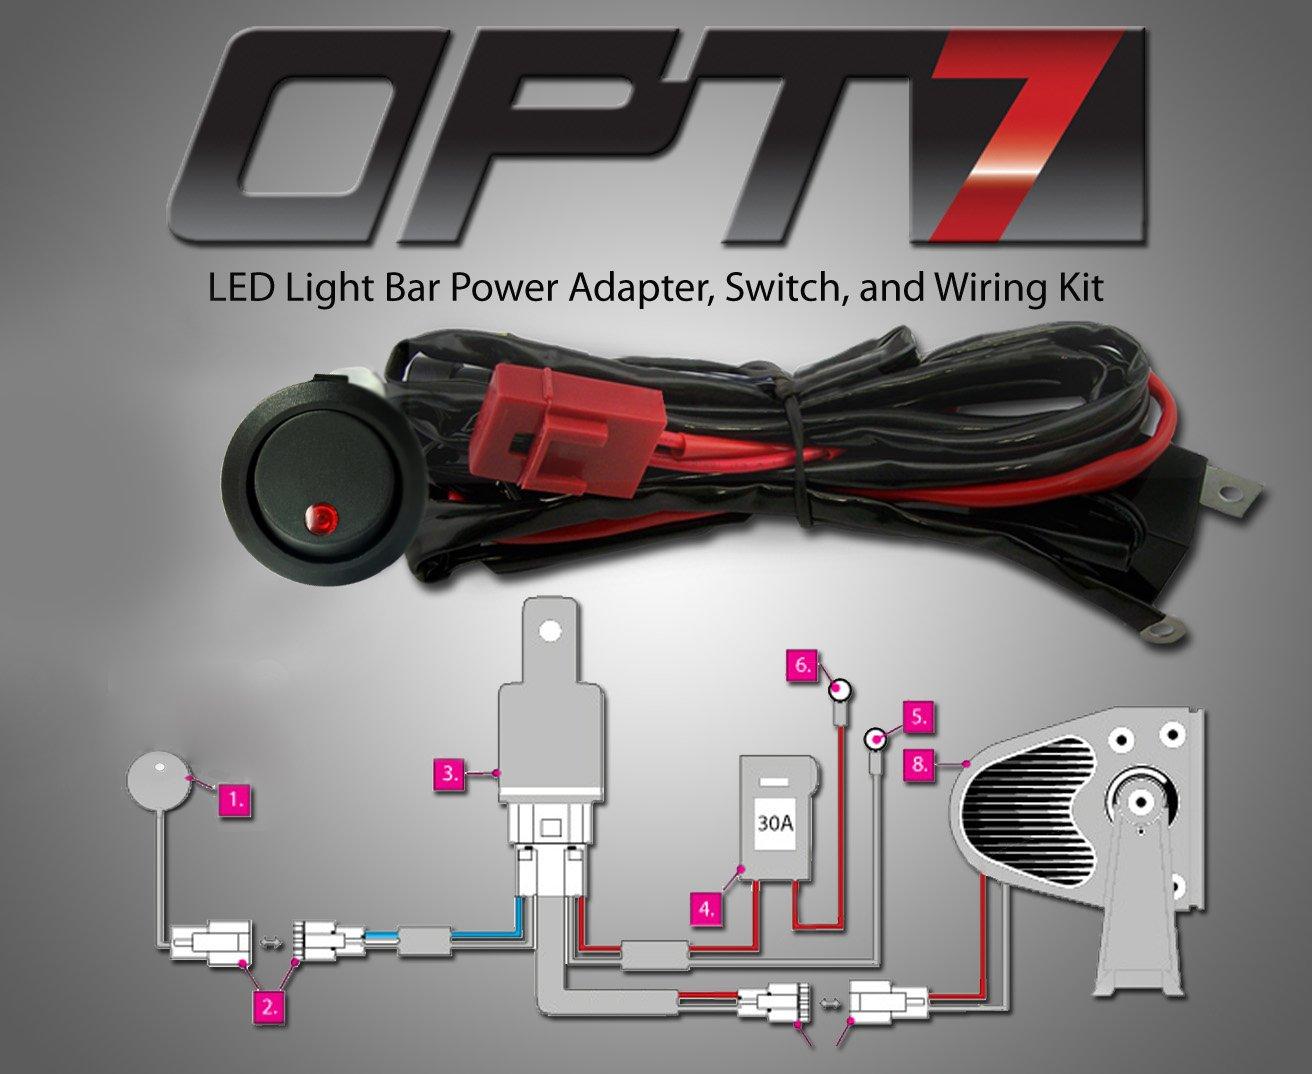 Amazon.com OPT7 18w CREE Dually Off Road LED Spot Lights [4 Pack] 4  Heavy-Duty Waterproof Utility Work L& Pod - For ATV UTV Jeep - 1 Year Warranty ... : wiring off road lights - yogabreezes.com